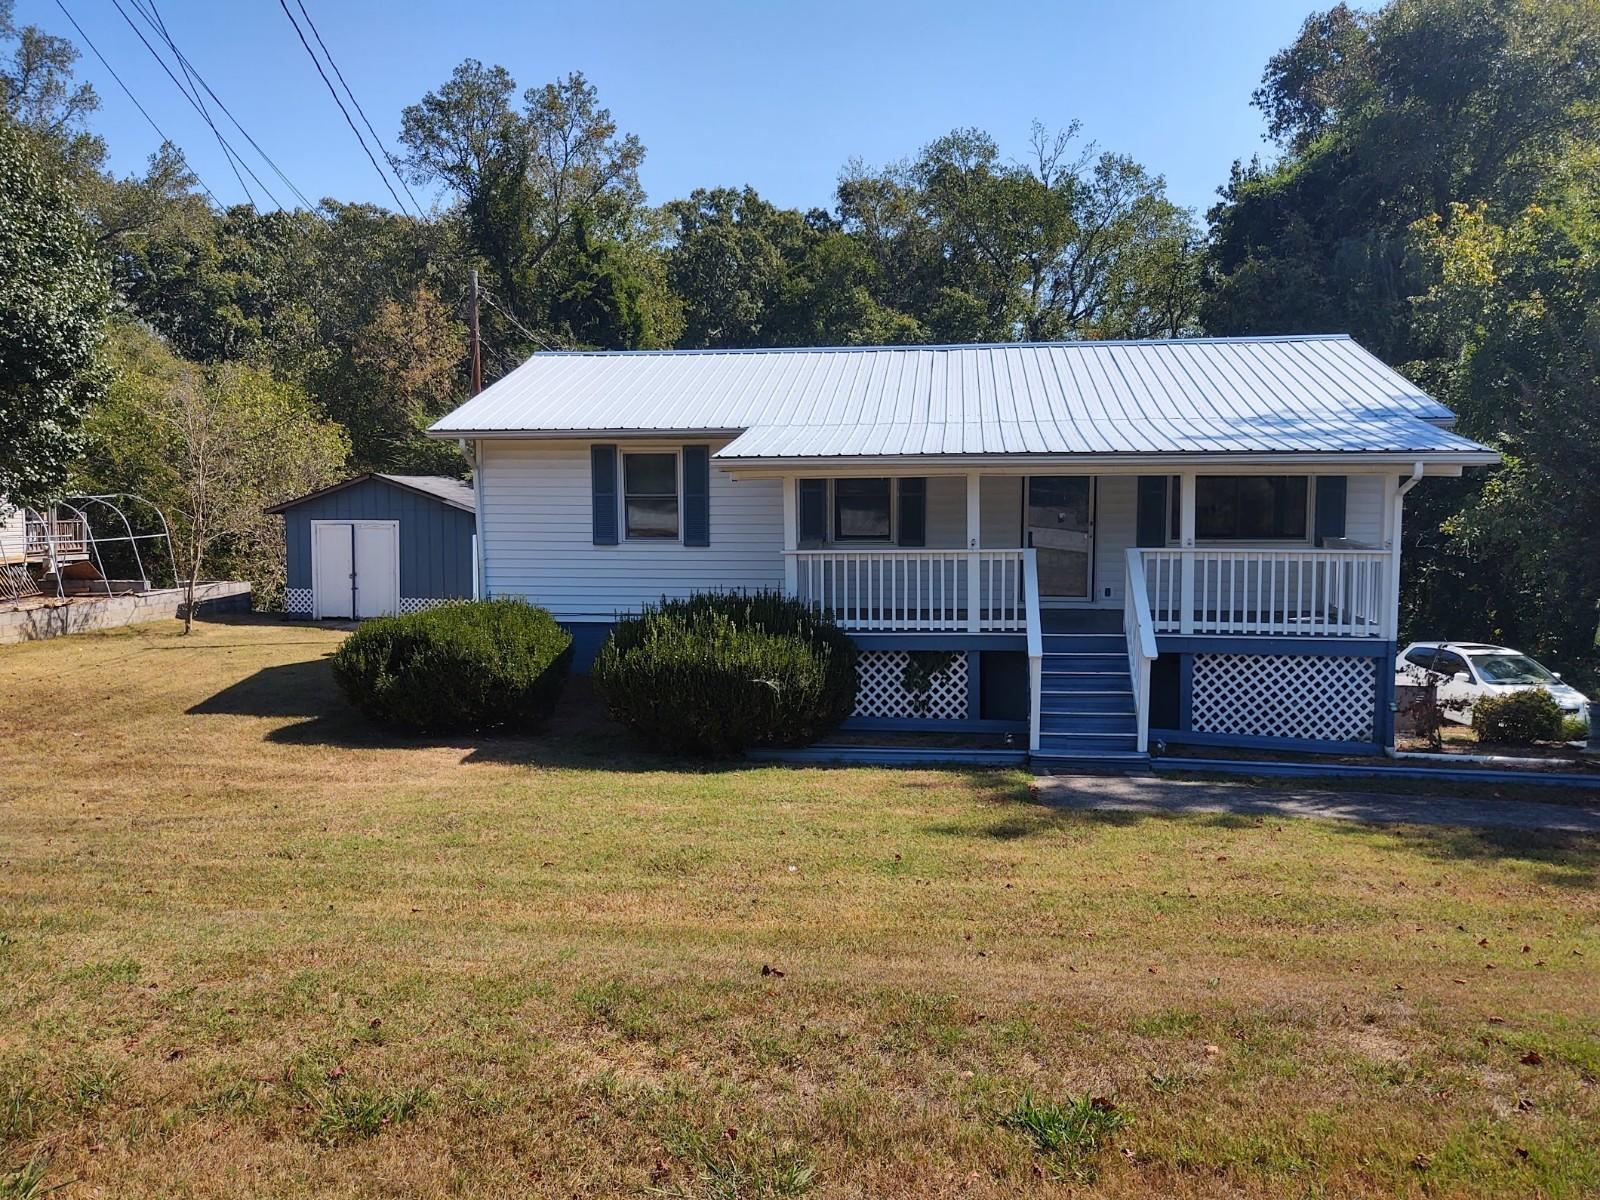 257 Woody Ave, Harriman, Tennessee 37748, 3 Bedrooms Bedrooms, ,2 BathroomsBathrooms,Single Family,For Sale,Woody,1097542